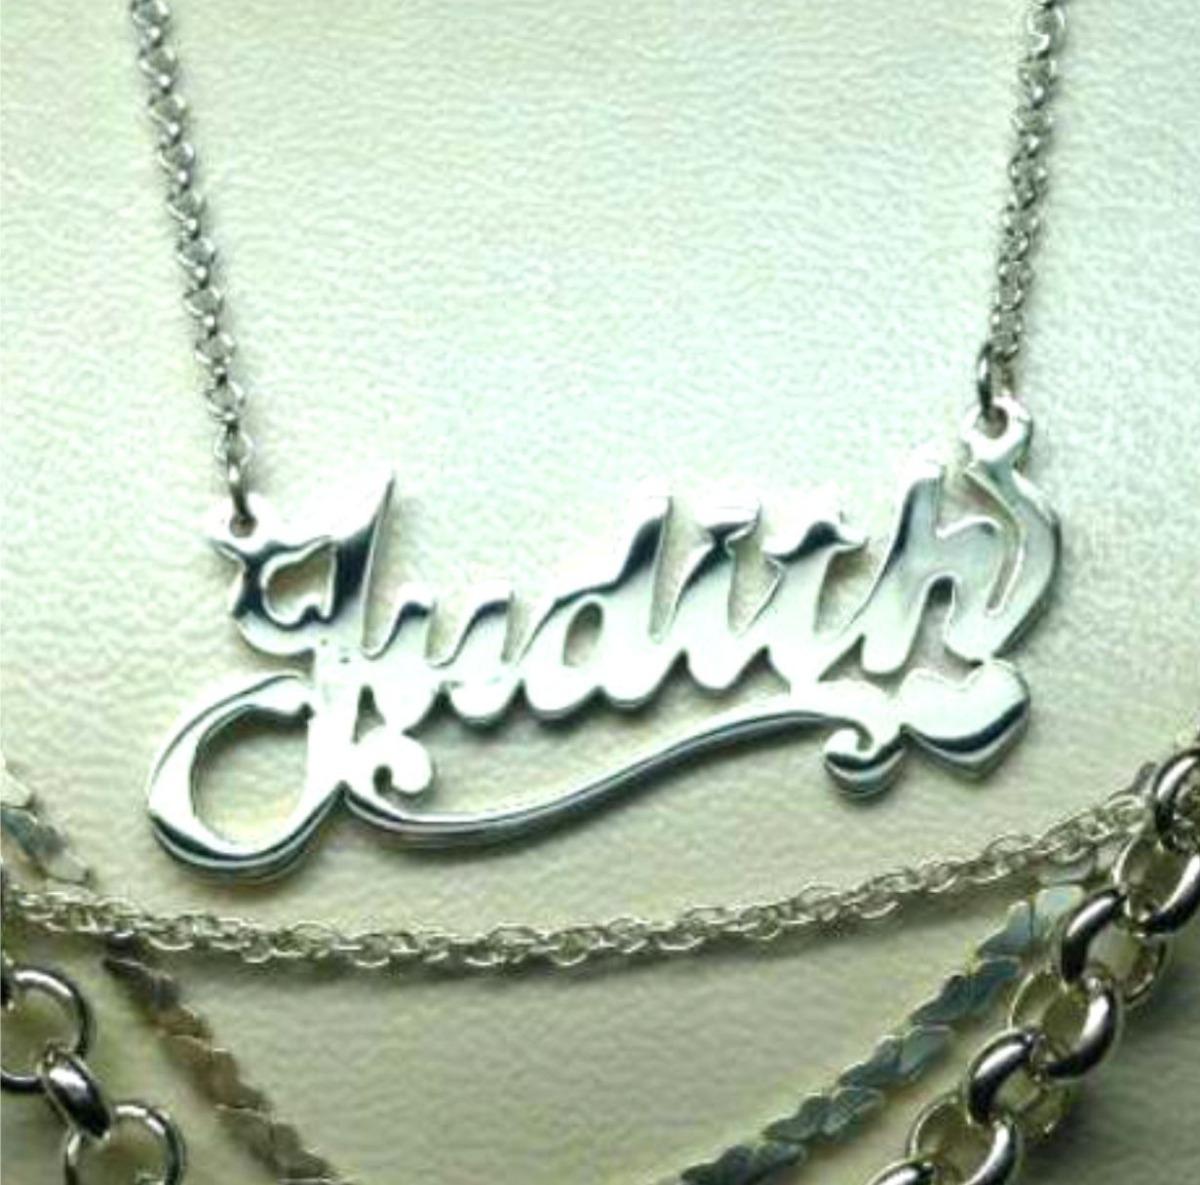 265d988e82d5 Collar Con Nombre ( Cadena + Dije ) Personalizado Plata 950 - S  90 ...